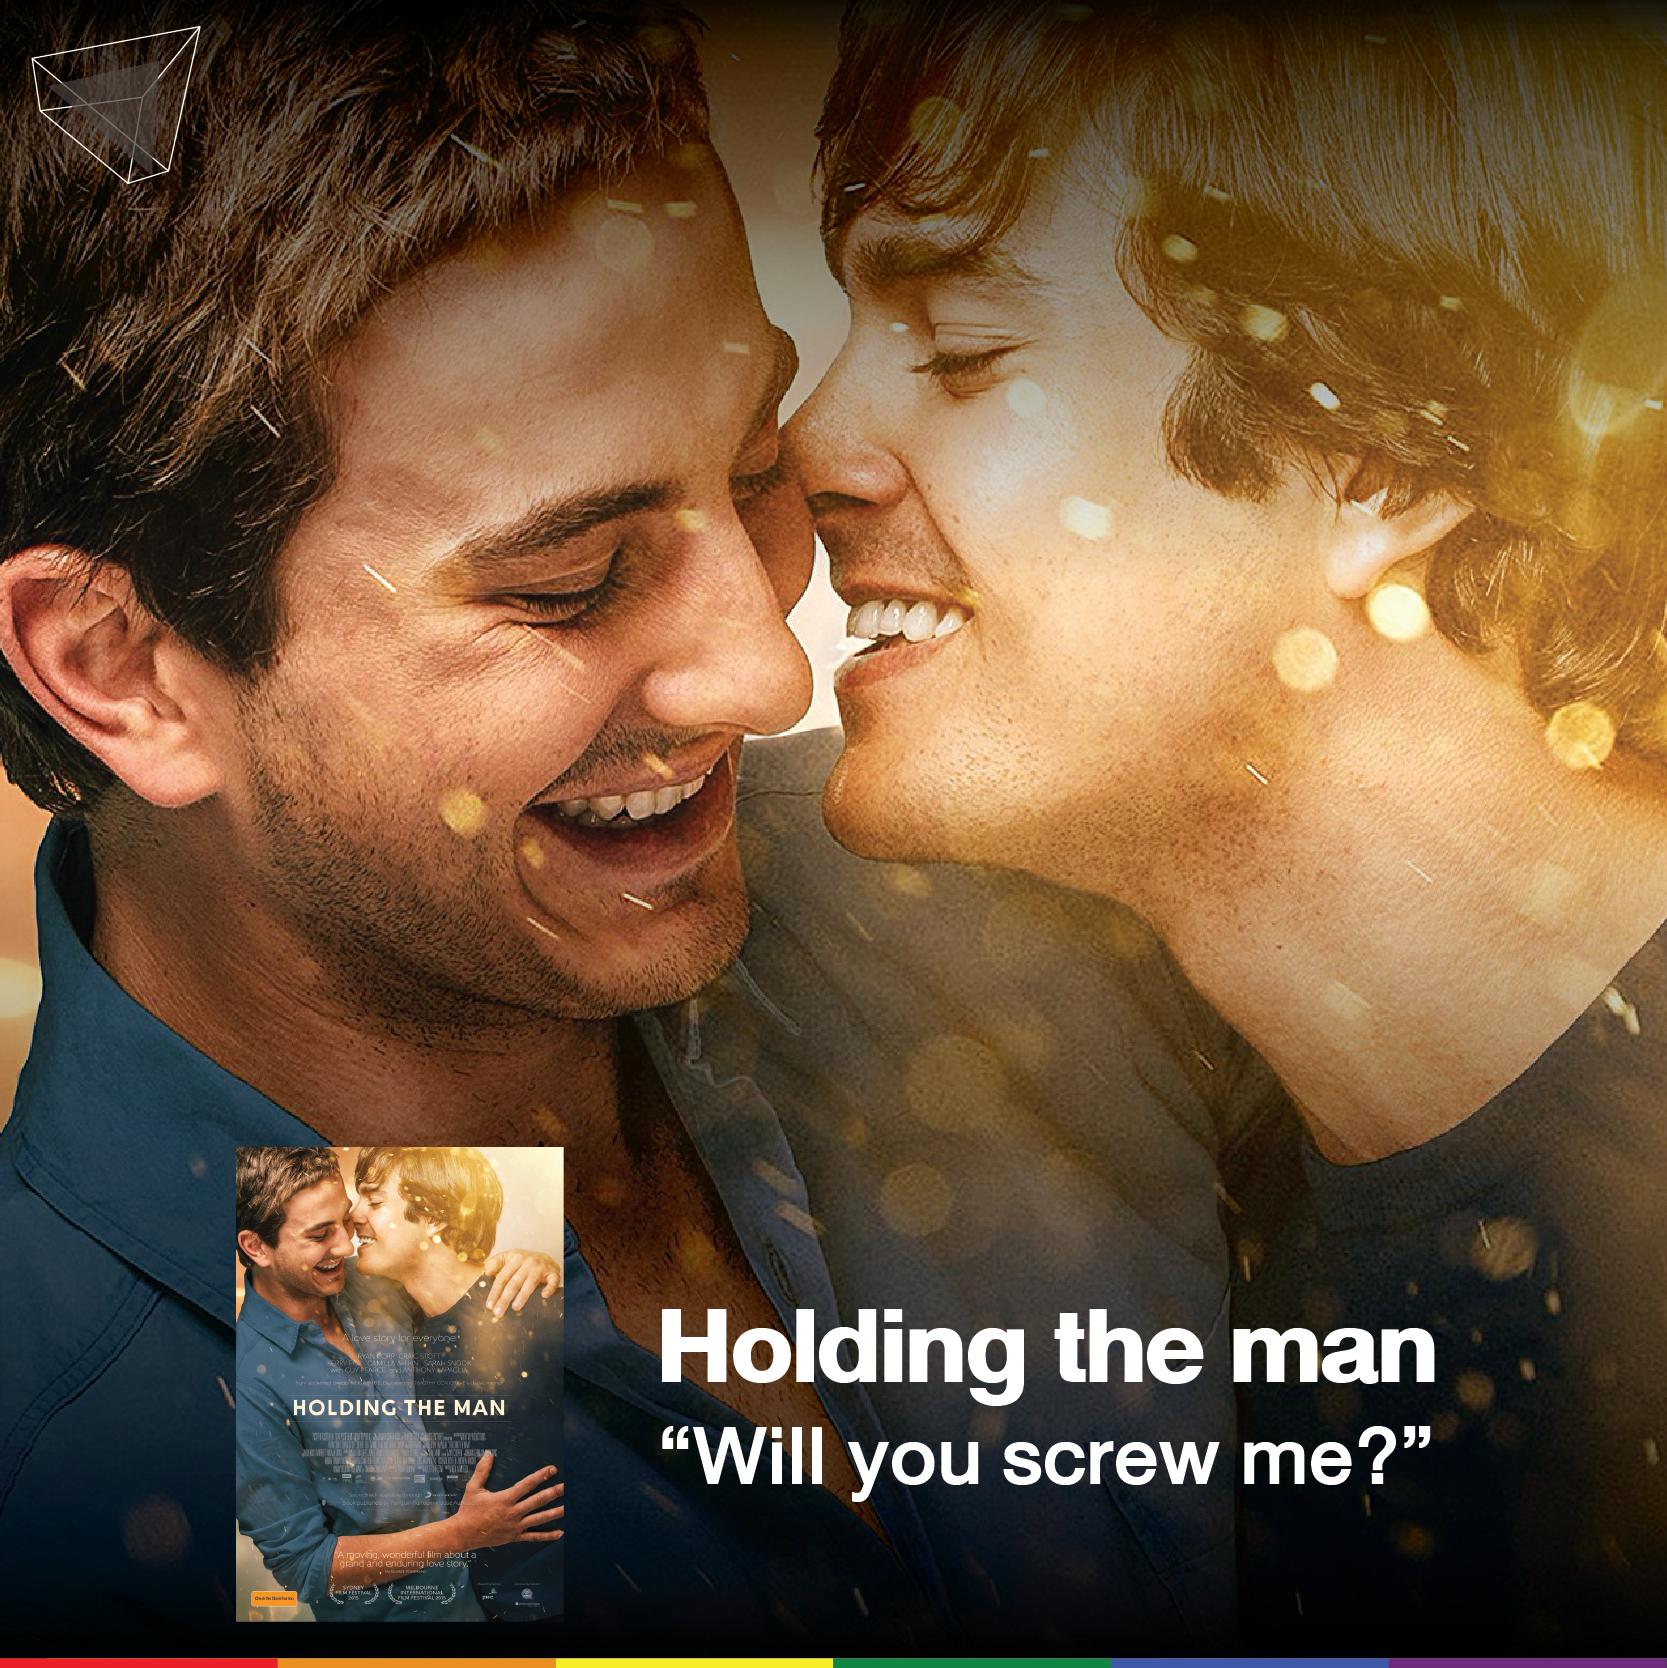 Holding the man (2015) หนังเกย์ฟีลกู้ดที่สร้างจากเรื่องจริง!